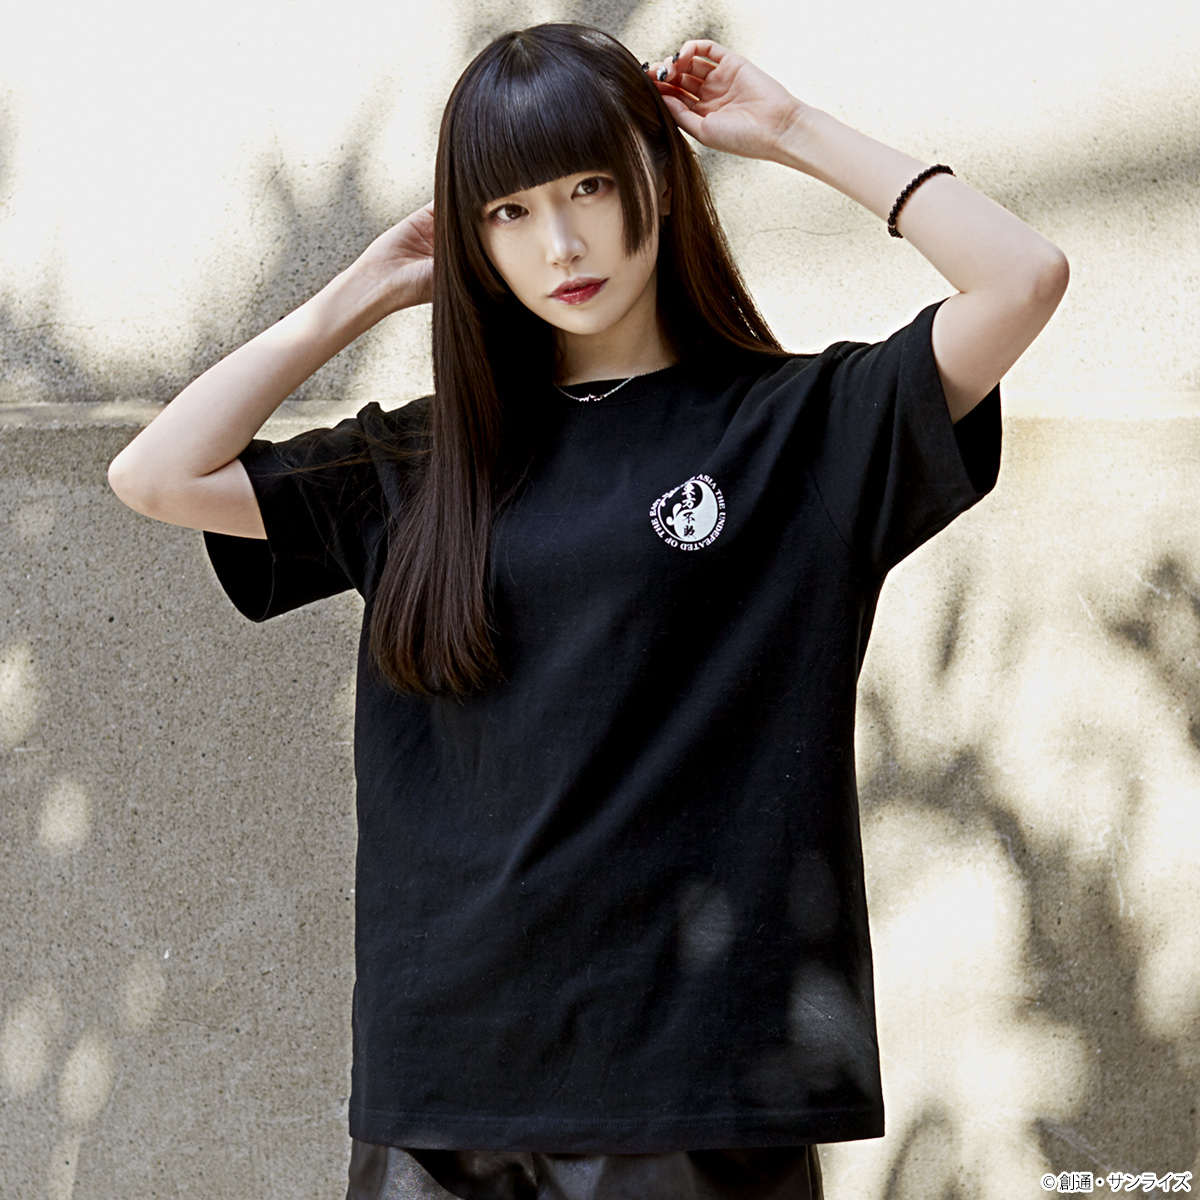 STRICT-G『機動武闘伝Gガンダム』 Tシャツ 東方不敗ロゴ